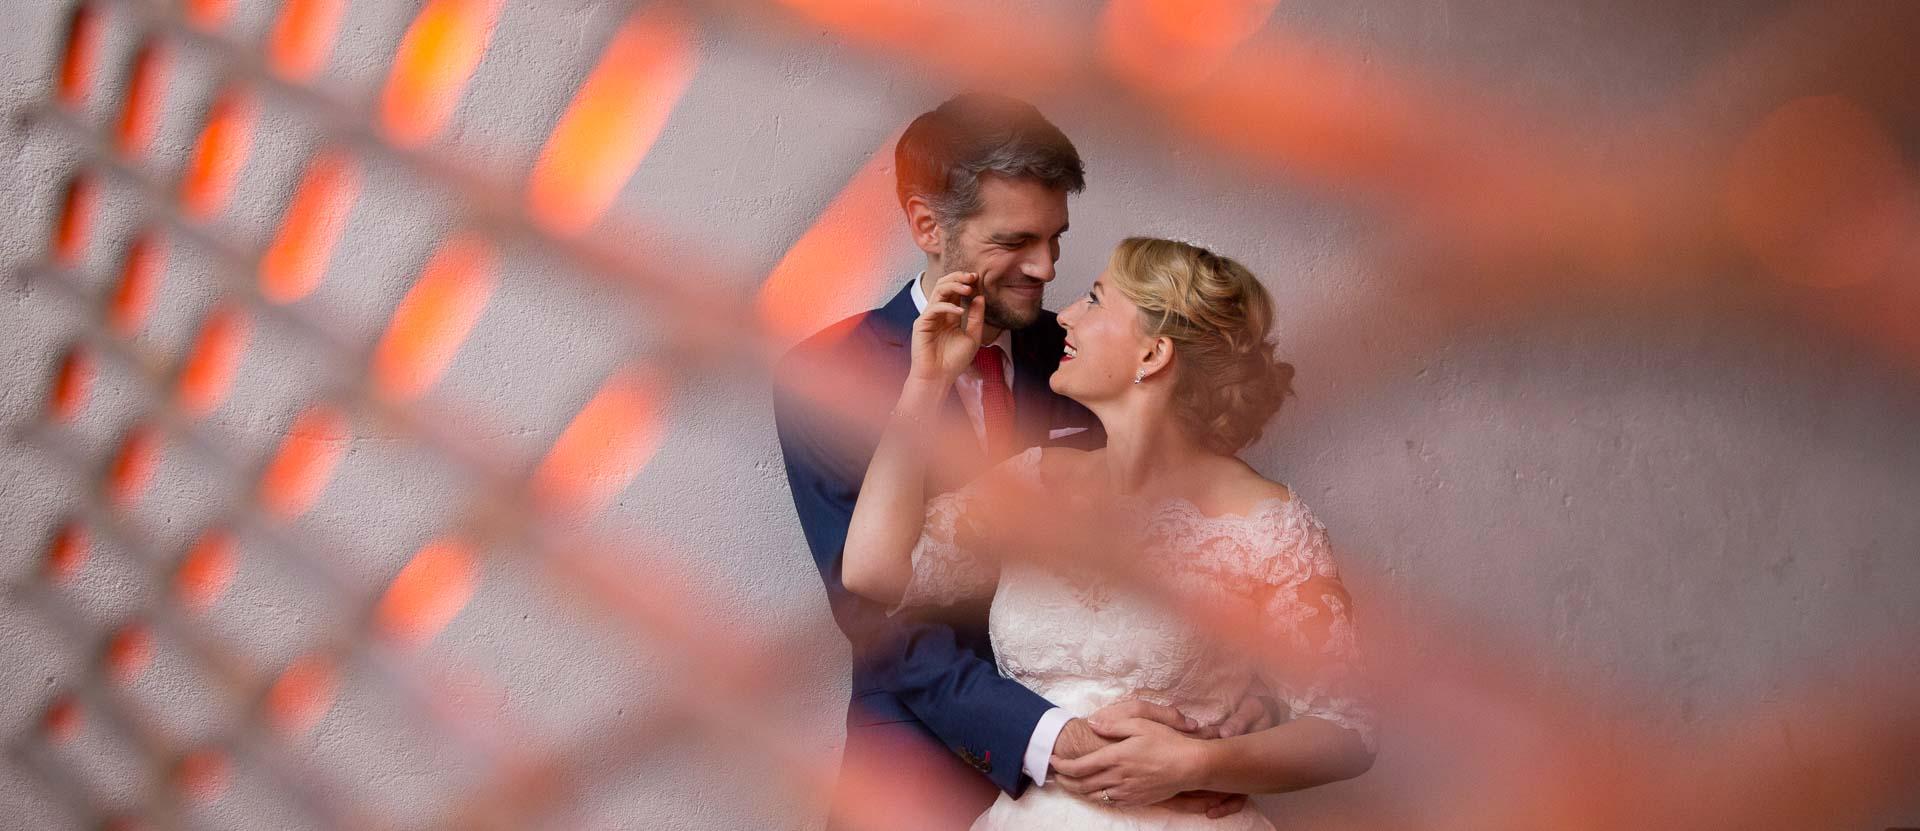 TrouwCamera - jullie trouwfotograaf